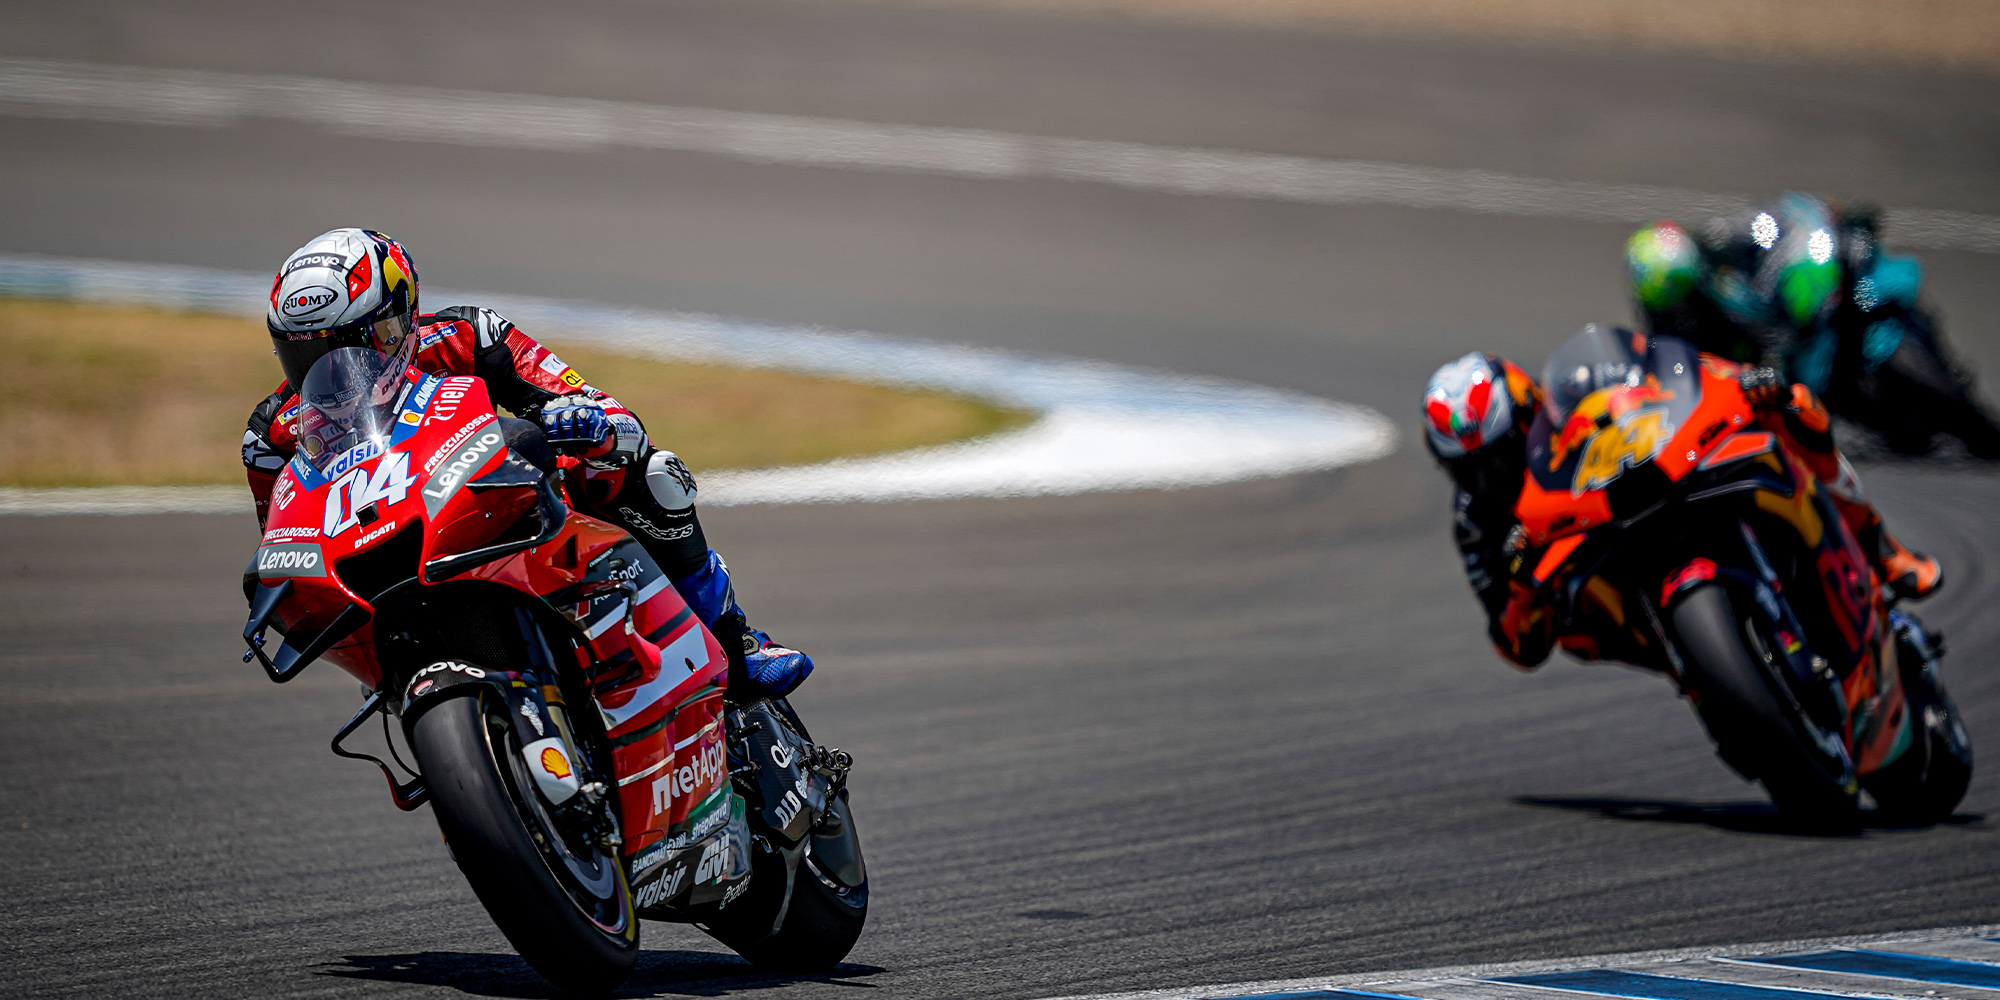 Andrea Dovozioso on his Ducati GP 20 during the 2020 MotoGP Spanish Grand Prix at Jerez